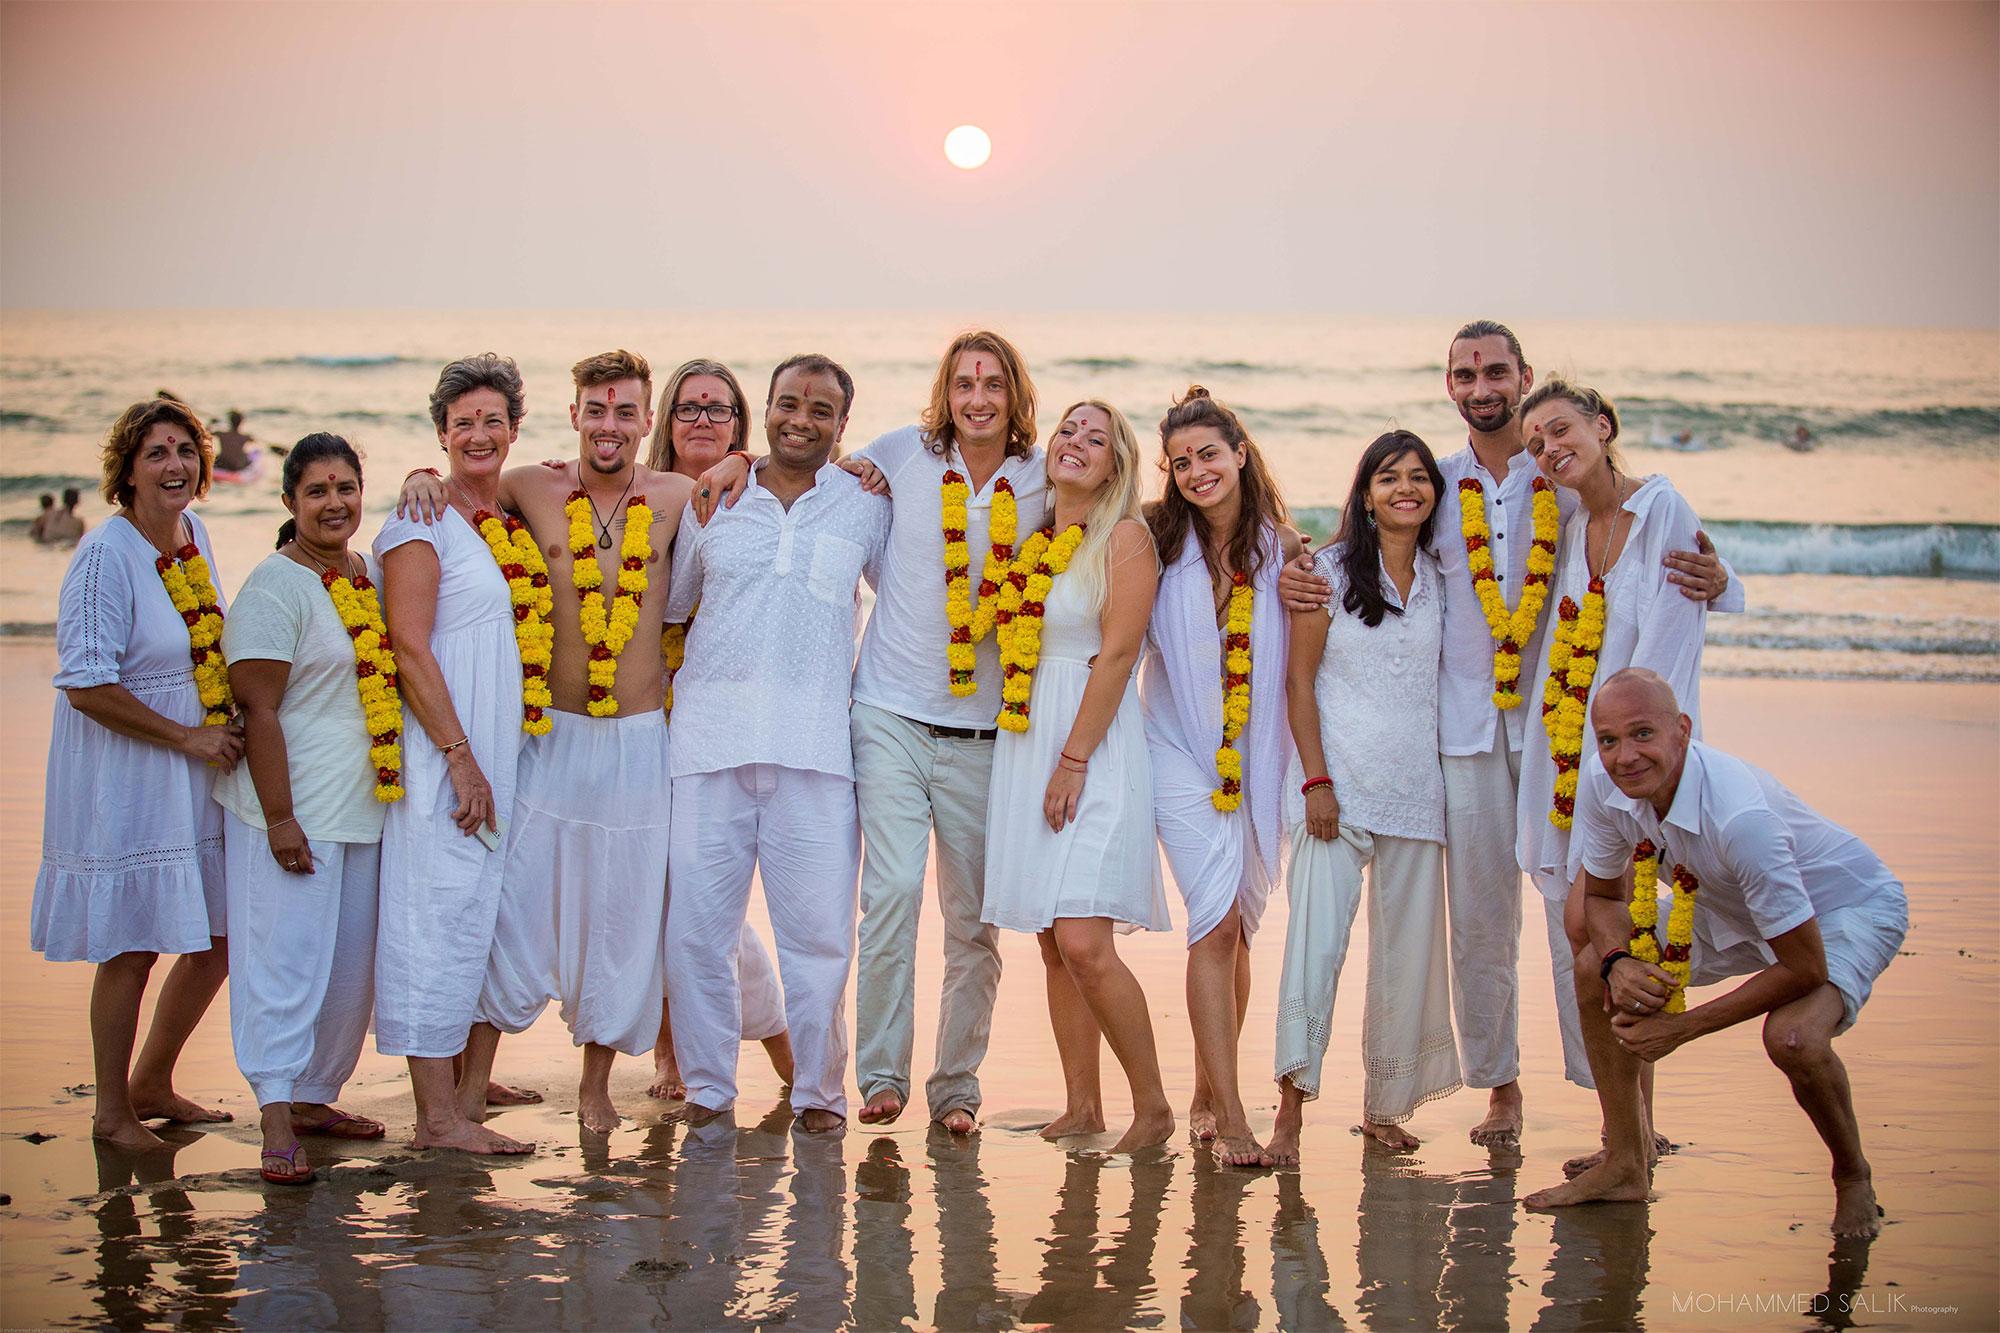 Aithein Ayurveda Massage School in Goa, India - Graduation Day